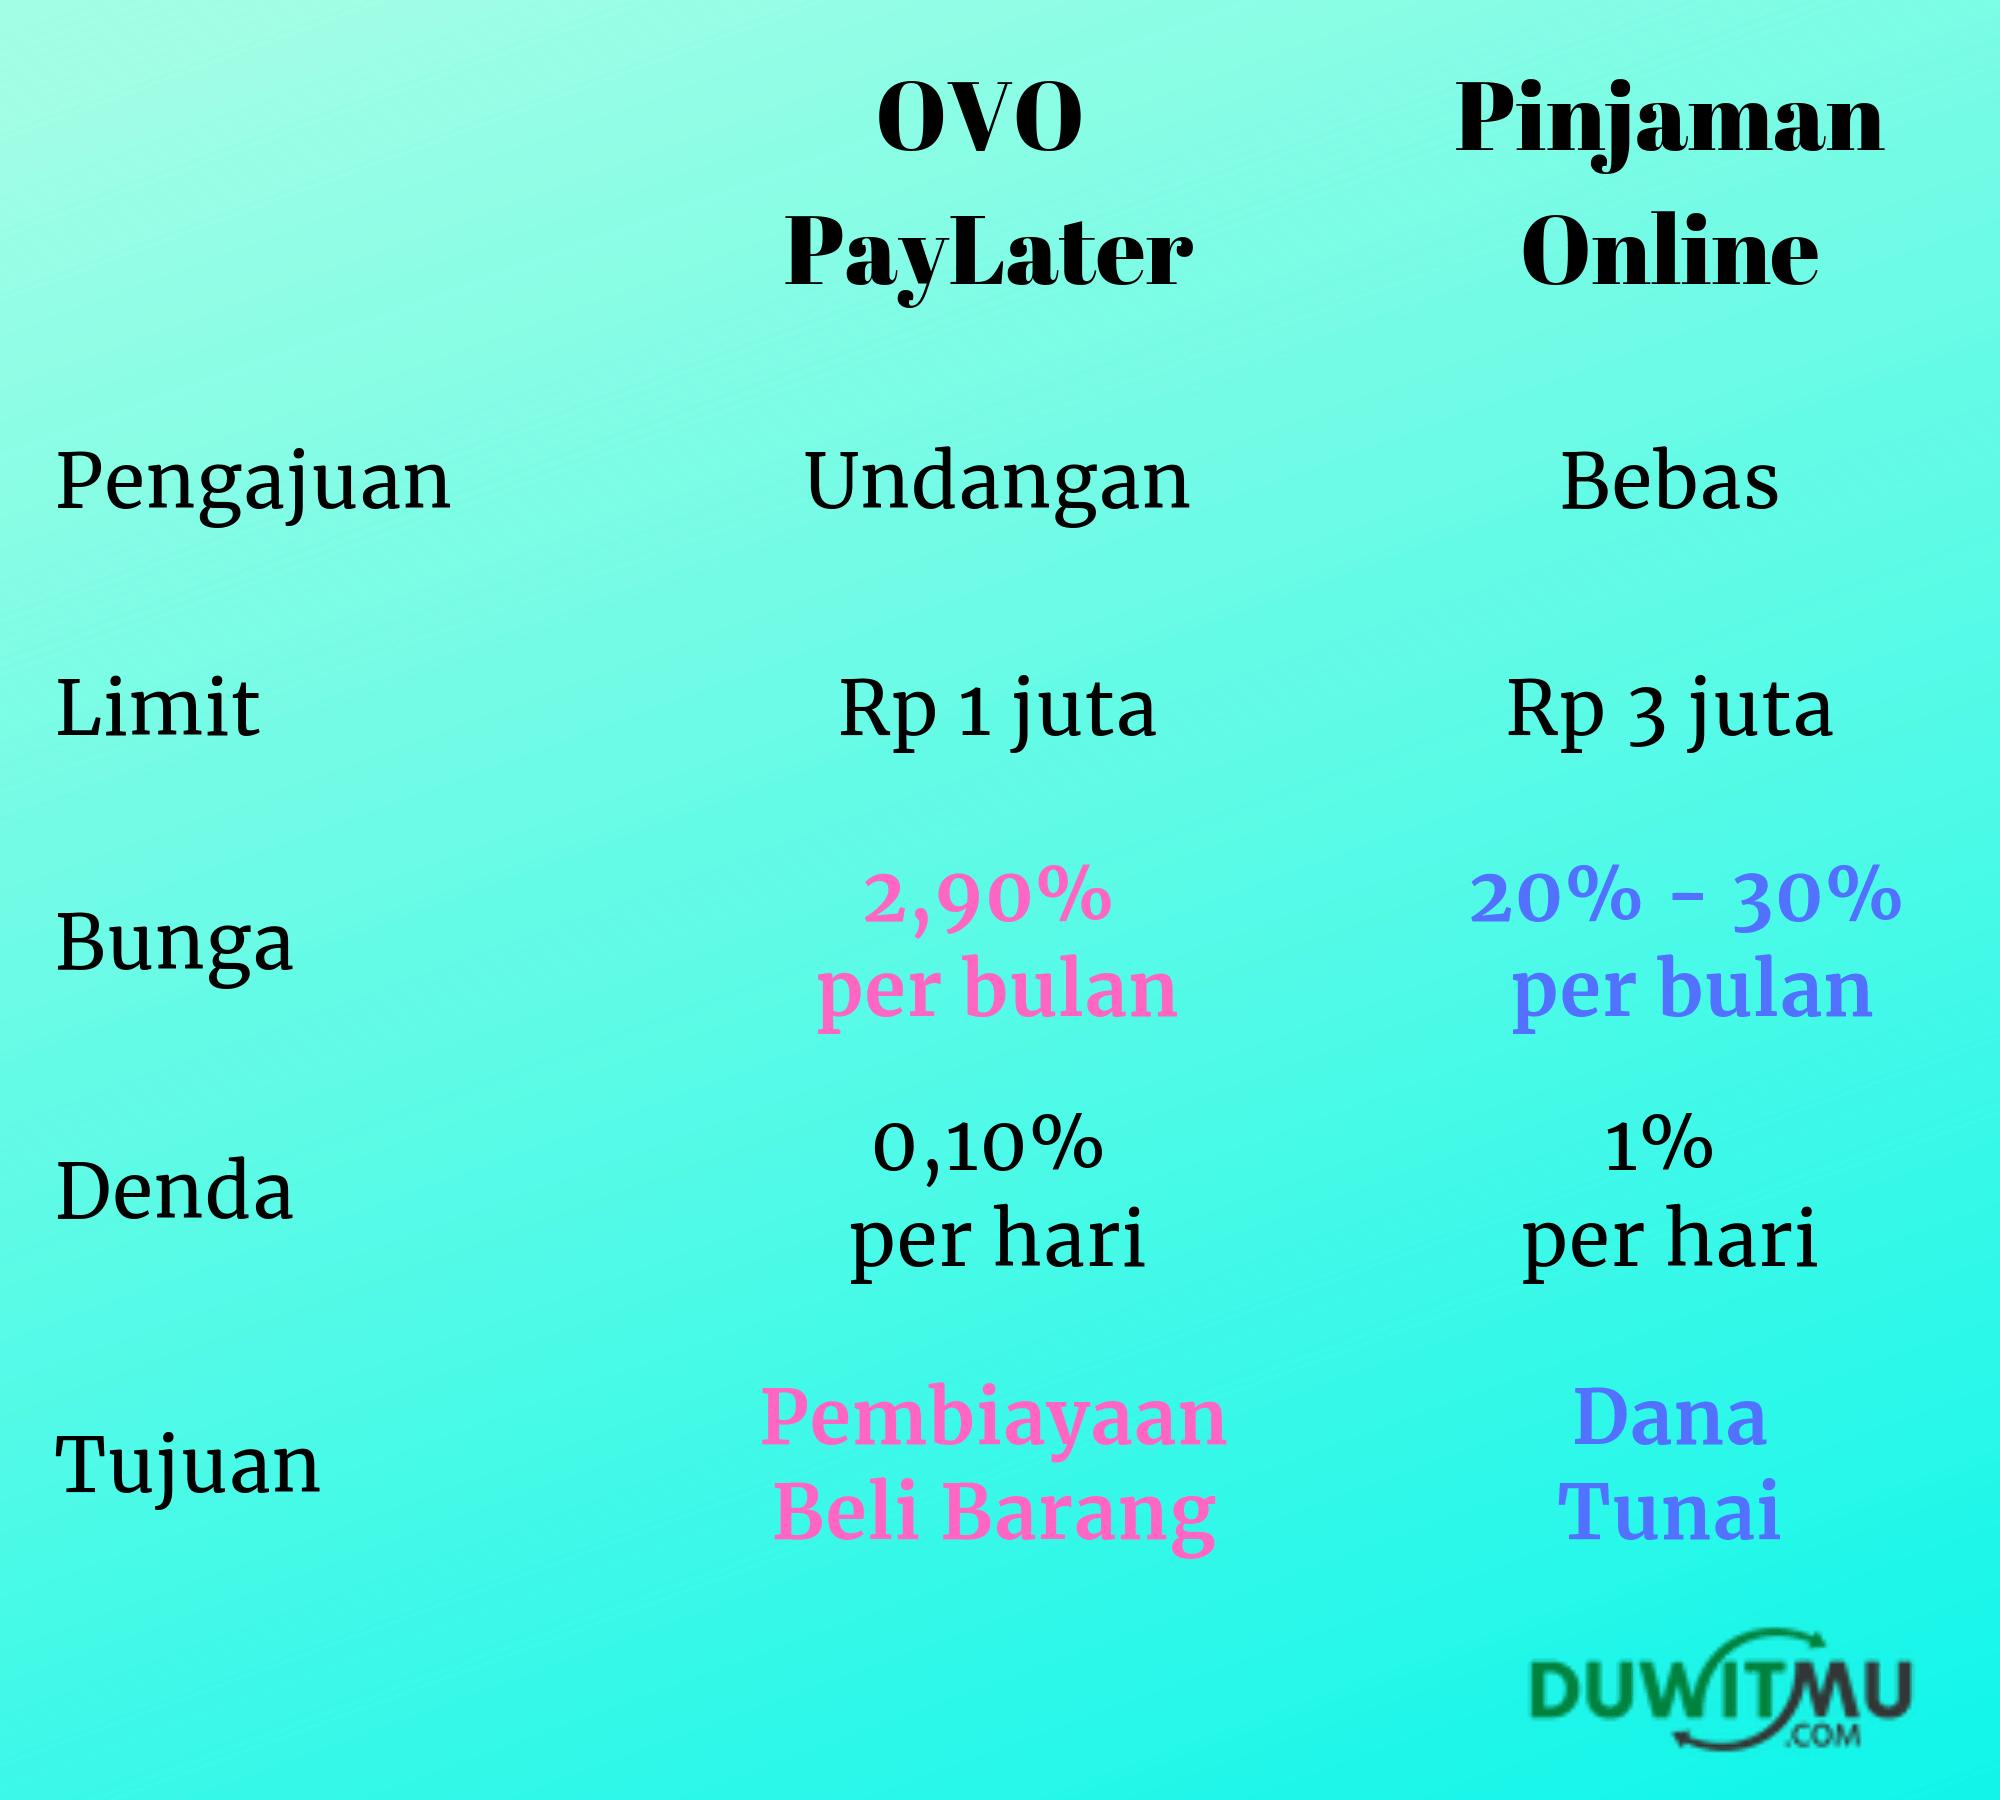 OVO PayLater vs Pinjaman Online, Siapa Terbaik